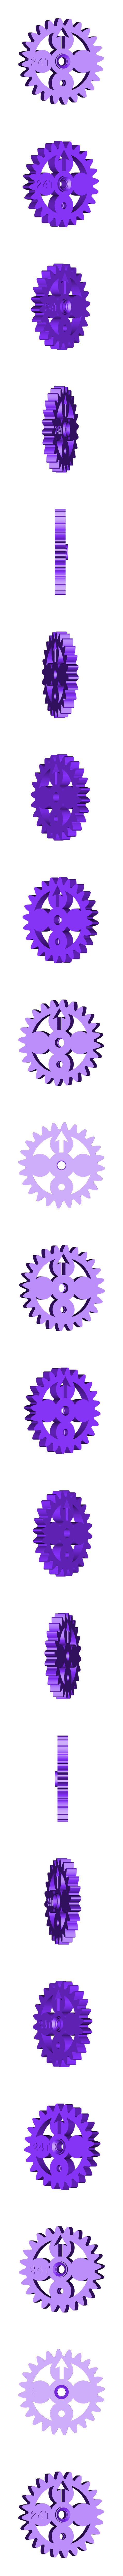 GEAR-24T_R2.stl Download free STL file Math Gear(s) • 3D print design, WorksBySolo